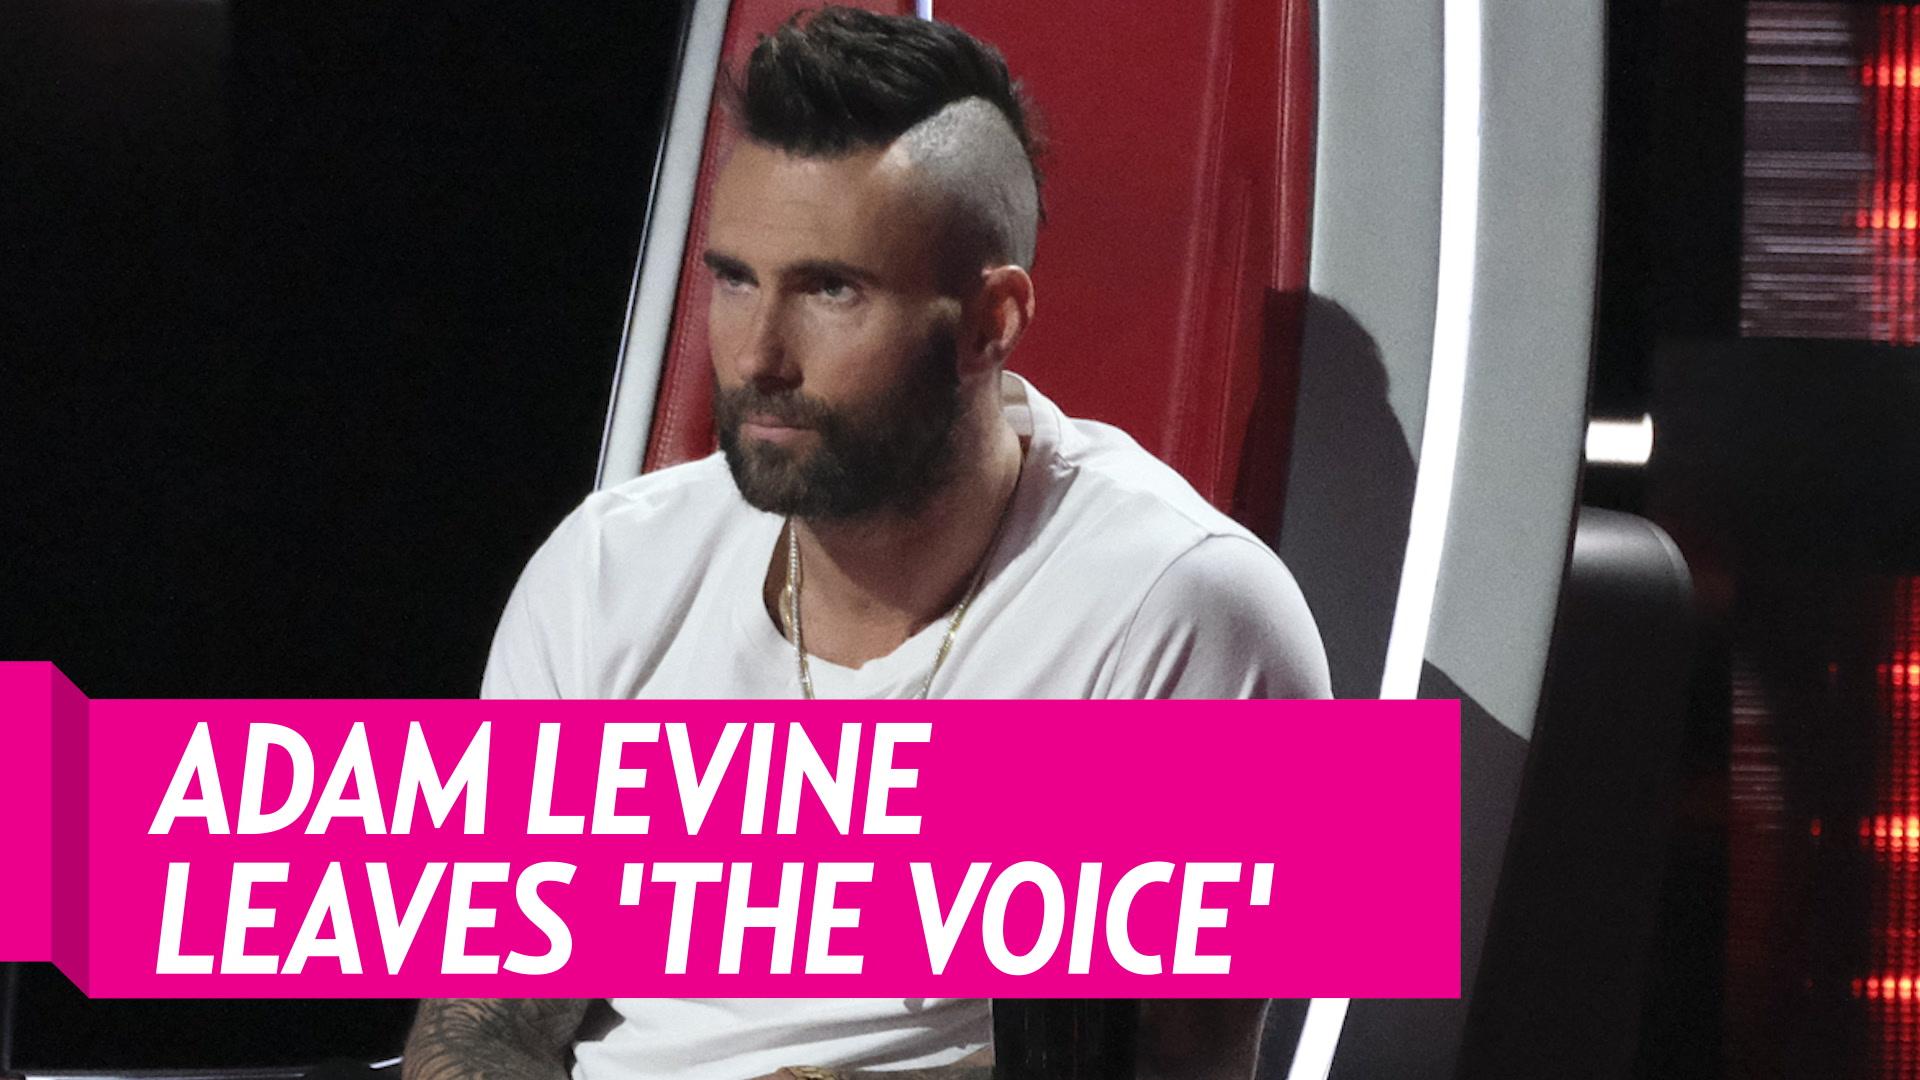 Adam Levine Exits 'The Voice' Ahead Of Season 17